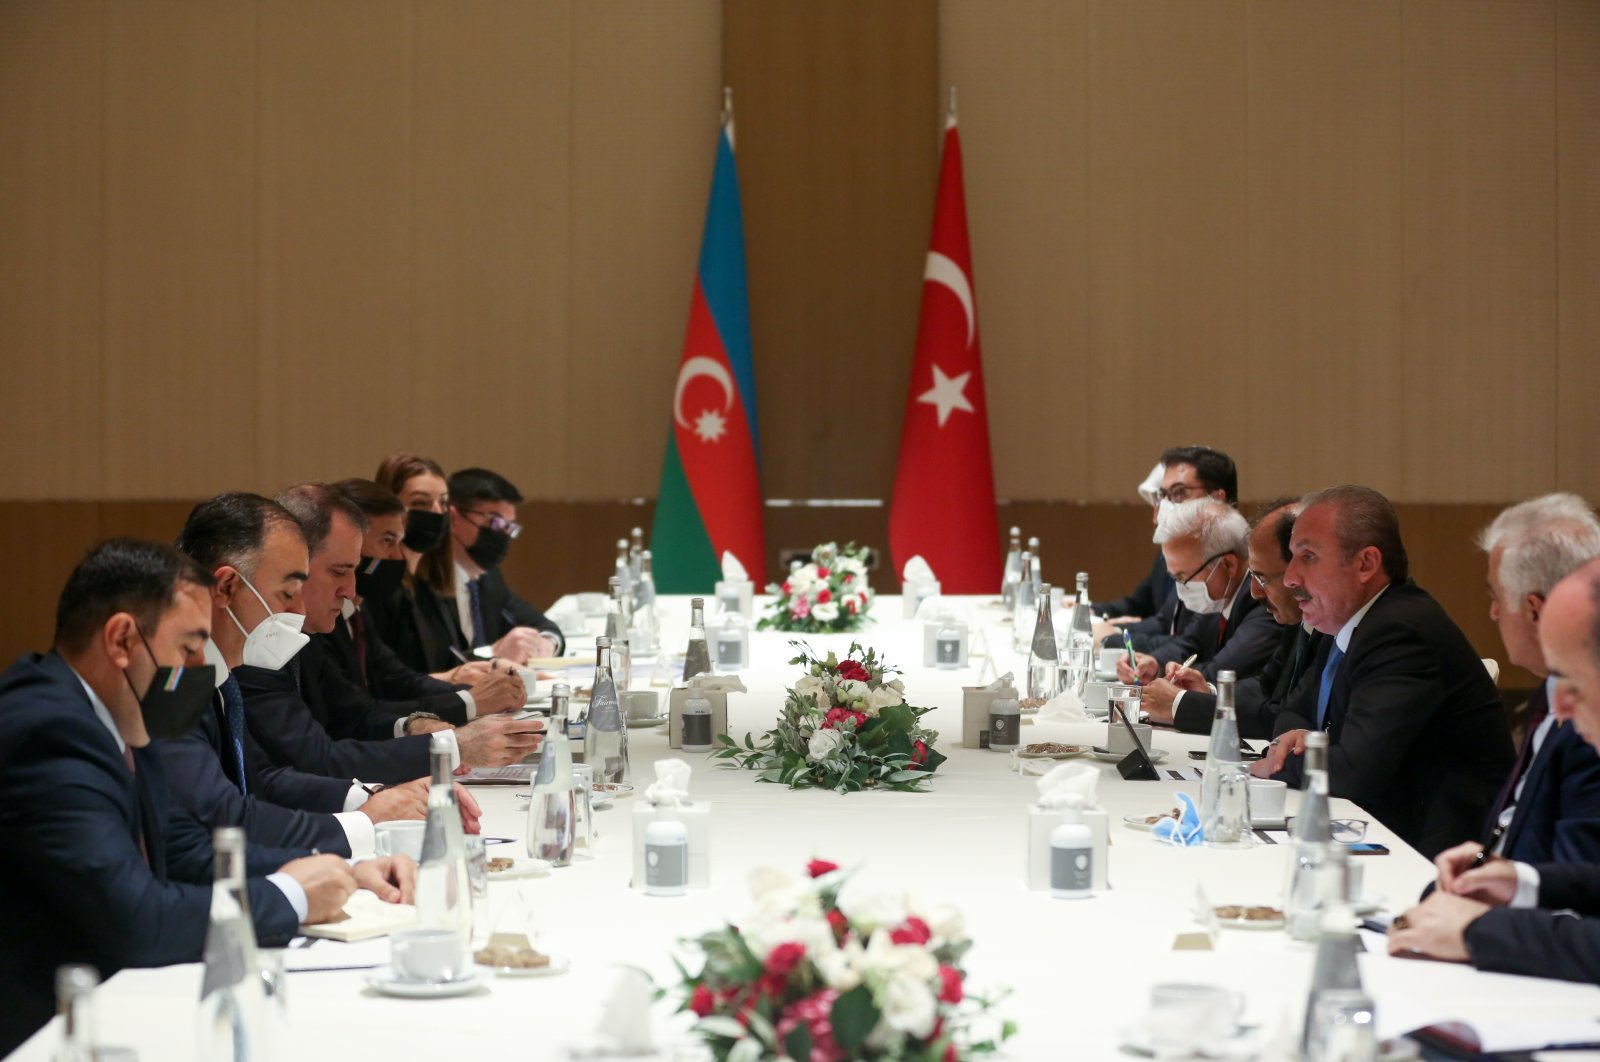 Turkey's Parliament Speaker Mustafa Şentop meets with Azerbaijan's Foreign Minister Jeyhun Bayramov in a delegation meeting in Baku, Azerbaijan, on July 28, 2021. (AA Photo)